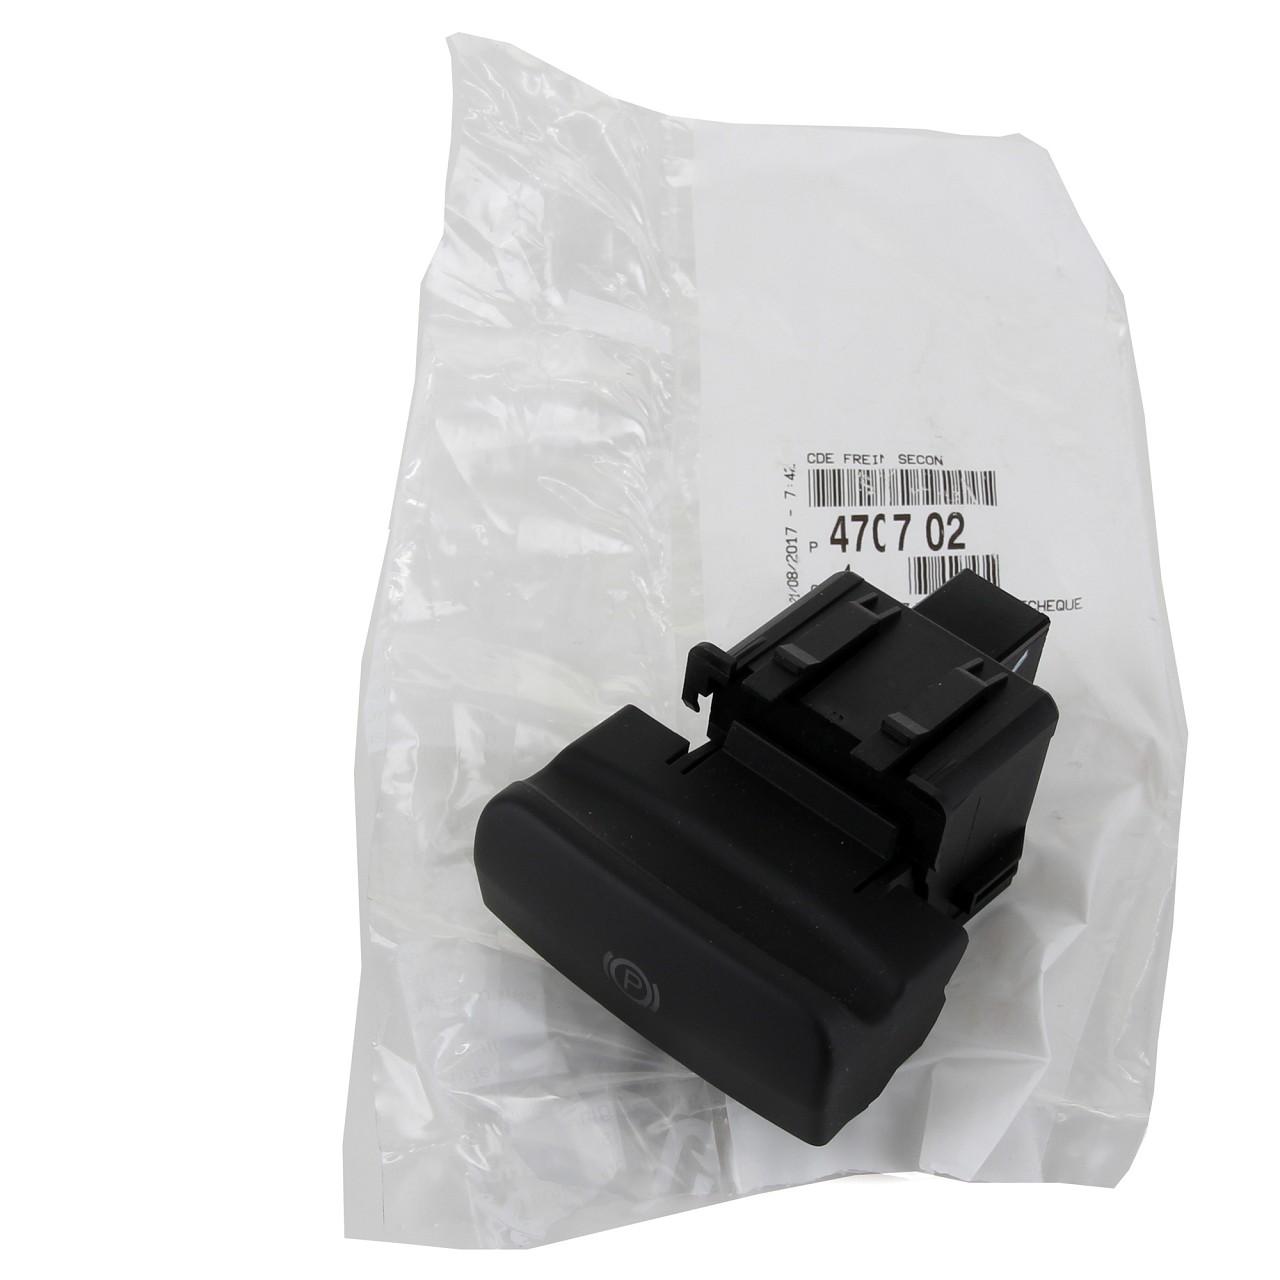 ORIGINAL Citroen Schalter Feststellbremse Parkbremse 4707.02 für C4 PICASSO I